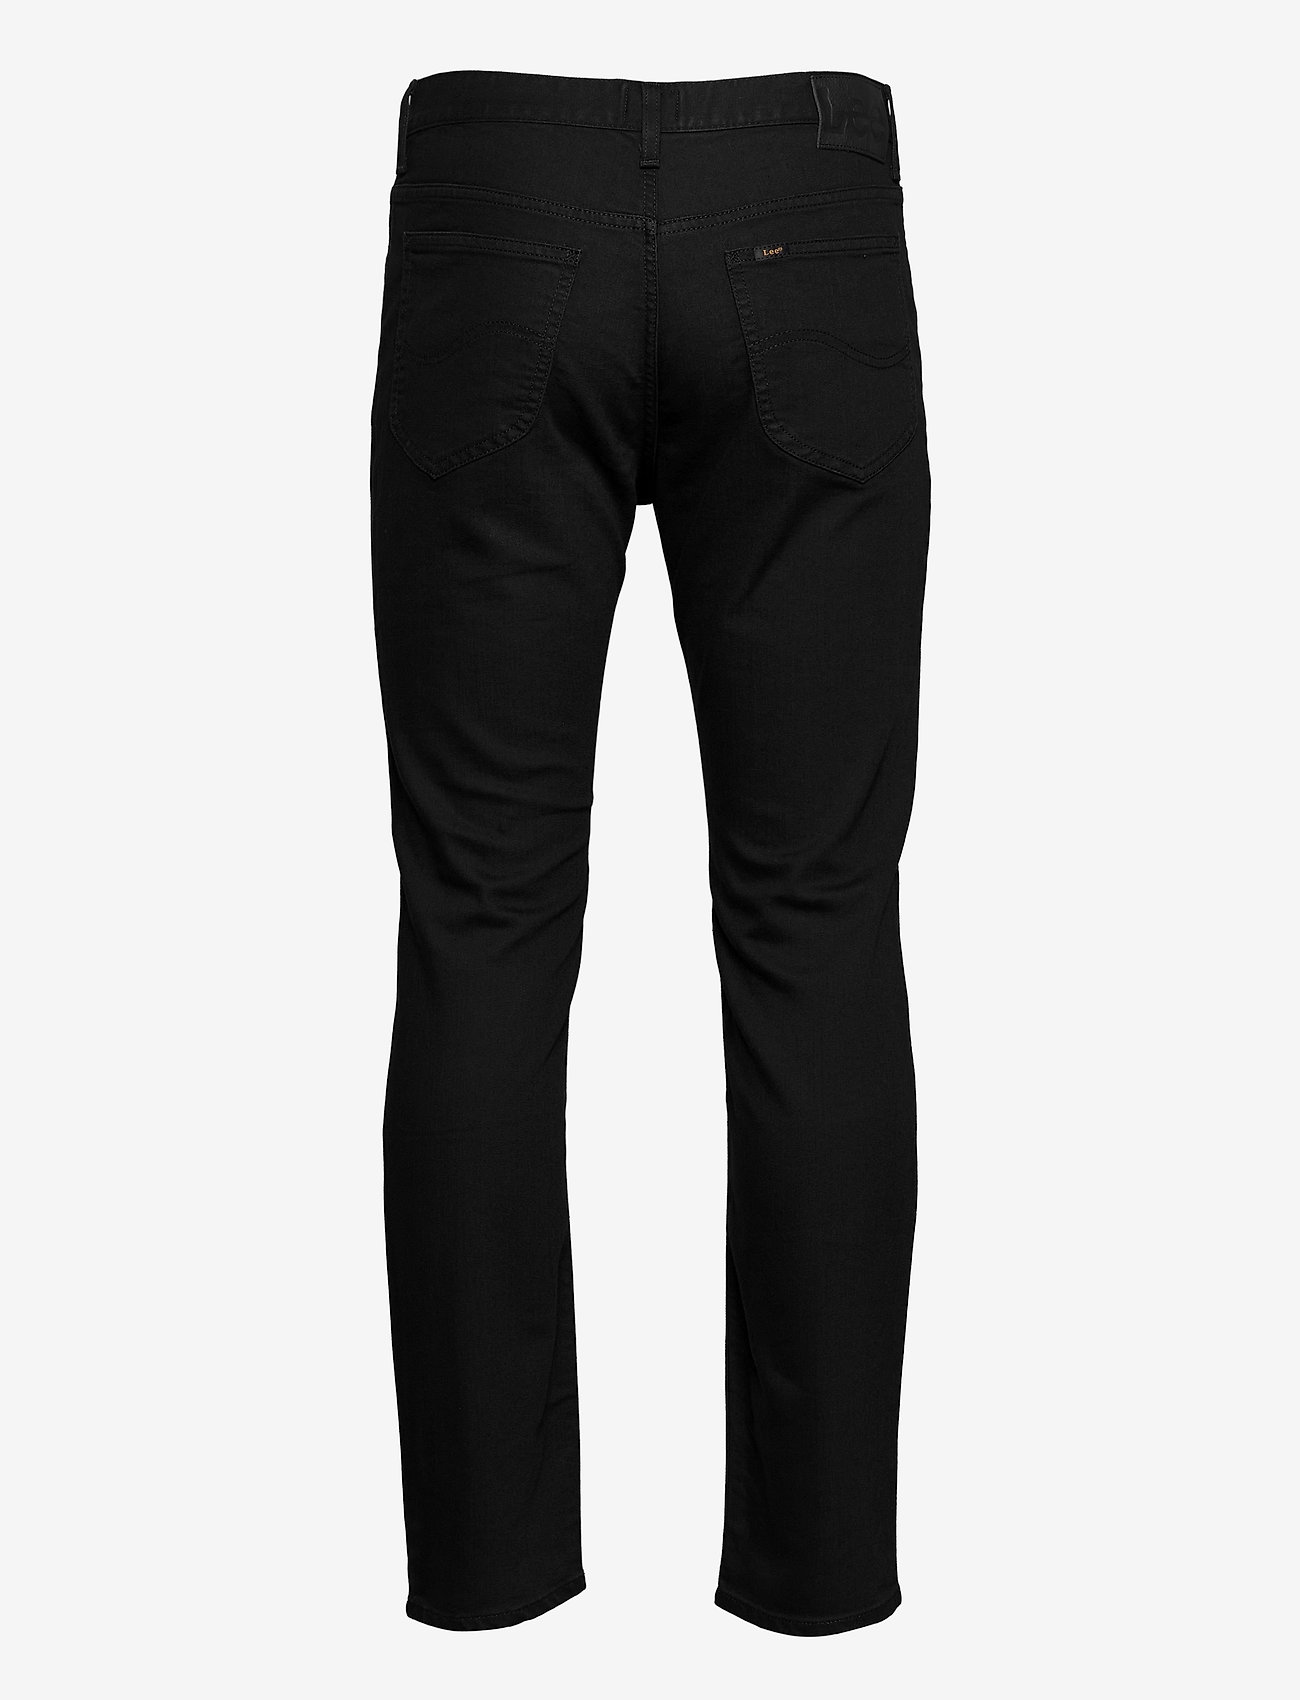 Lee Jeans Rider - Jeans BLACK RINSE - Menn Klær